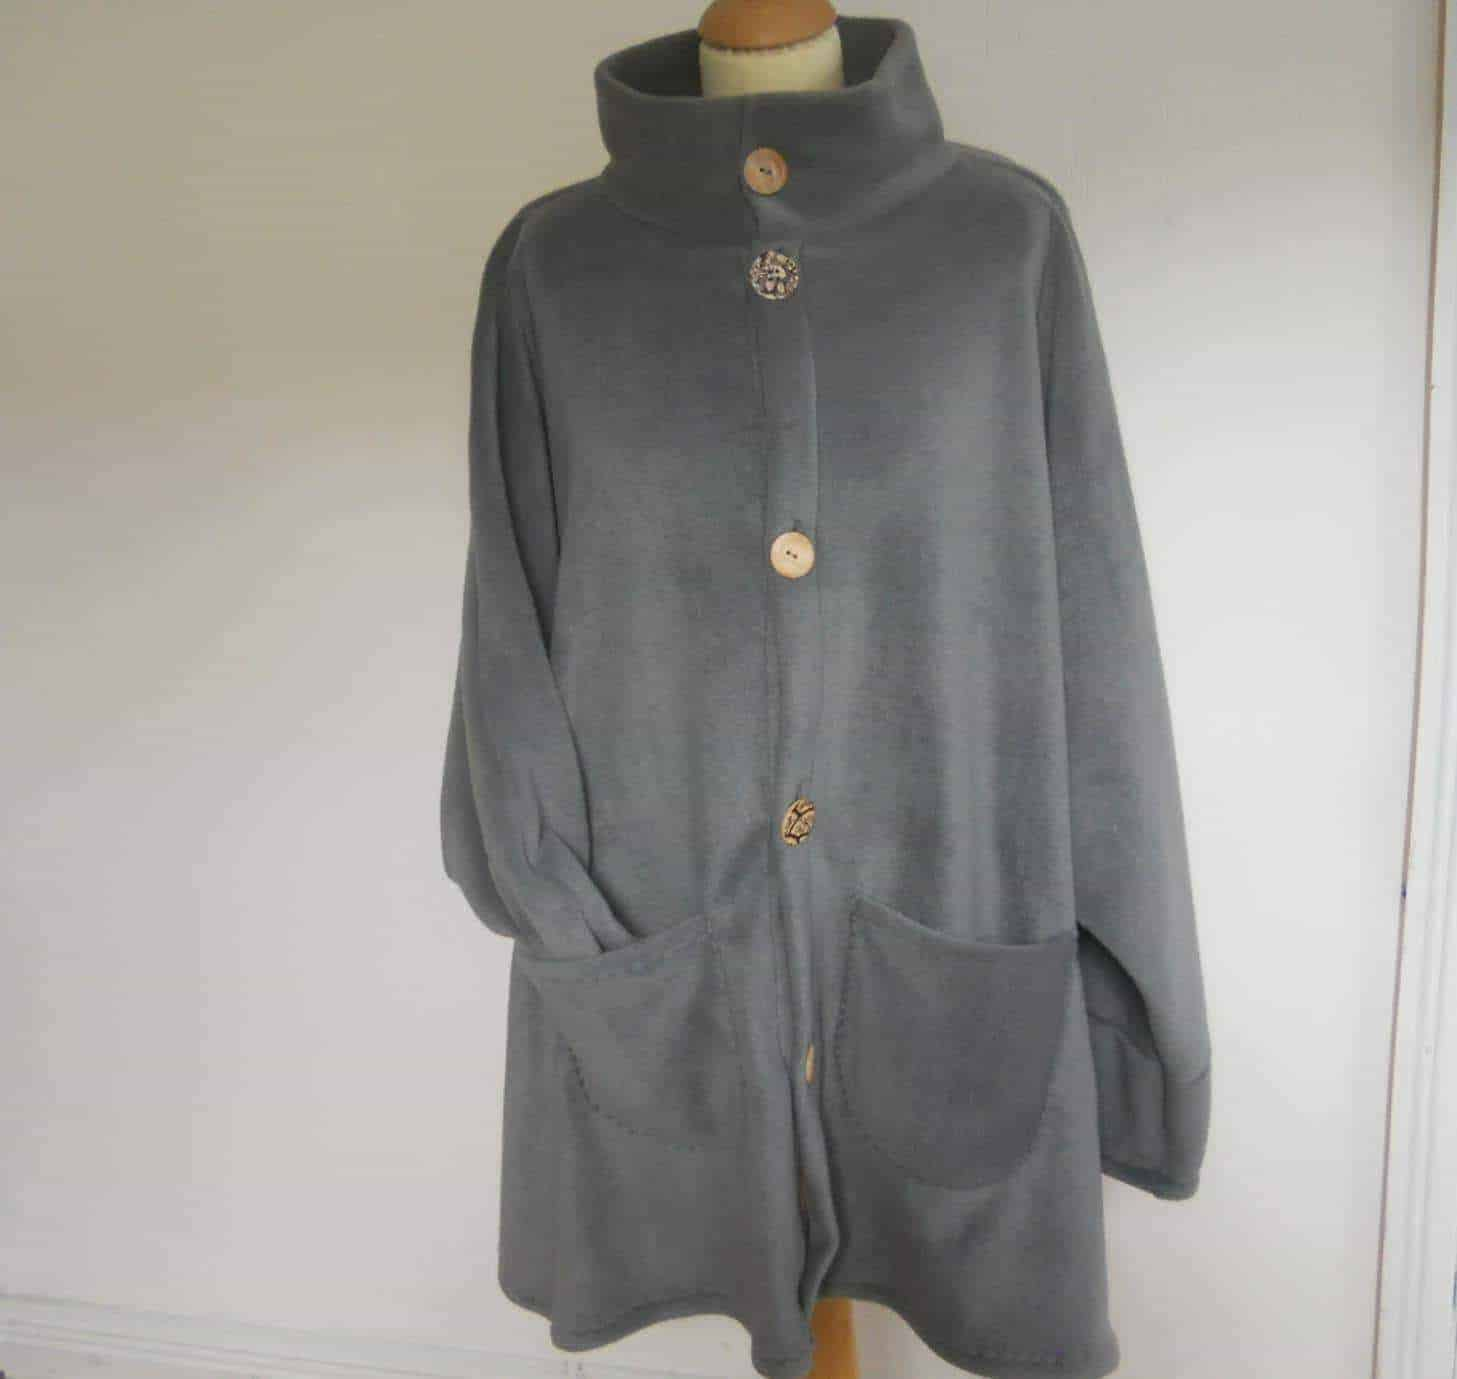 Childrens Fleece Jackets